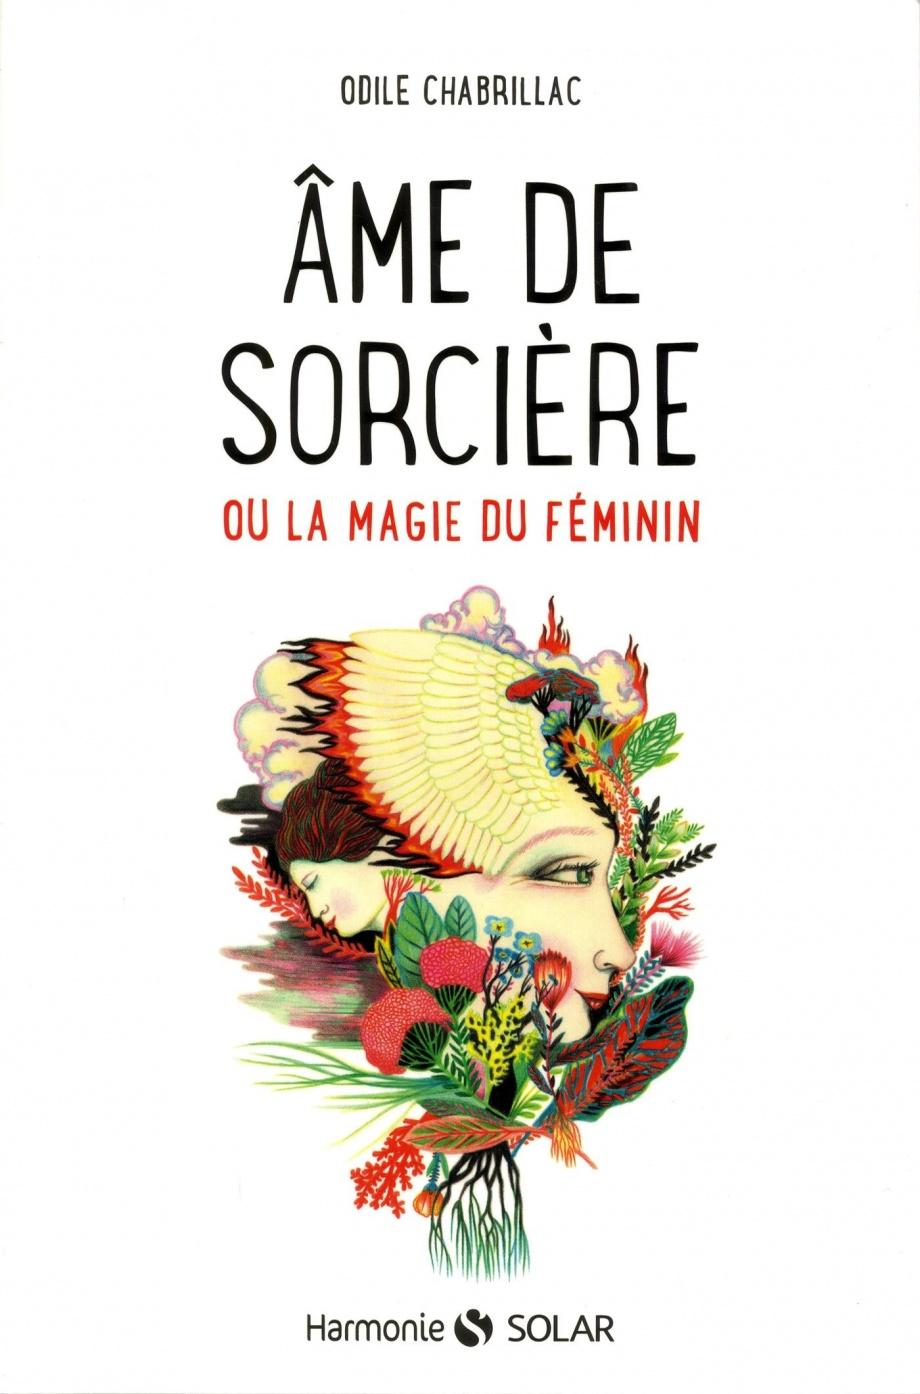 https://images.leslibraires.ca/books/9782263148873/front/9782263148873_large.jpg